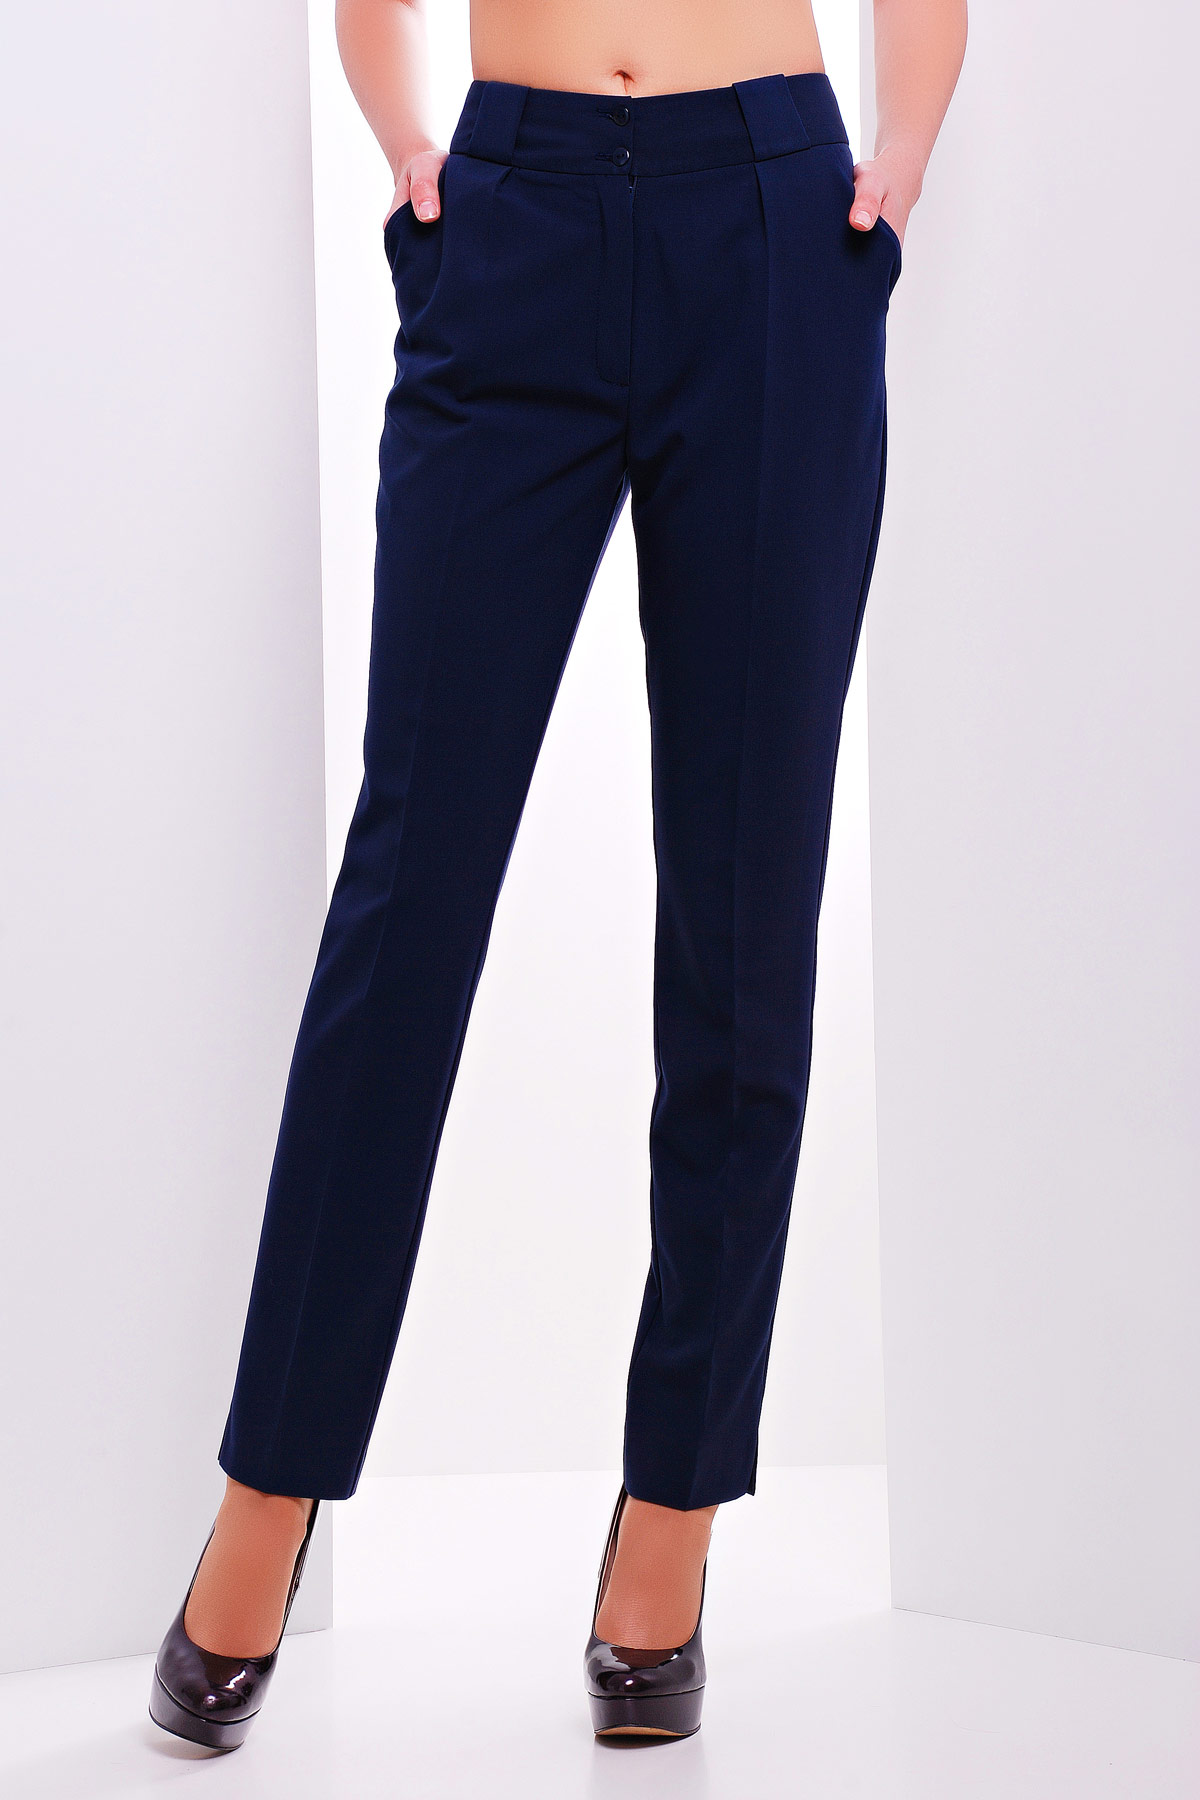 Синие брюки женские с доставкой